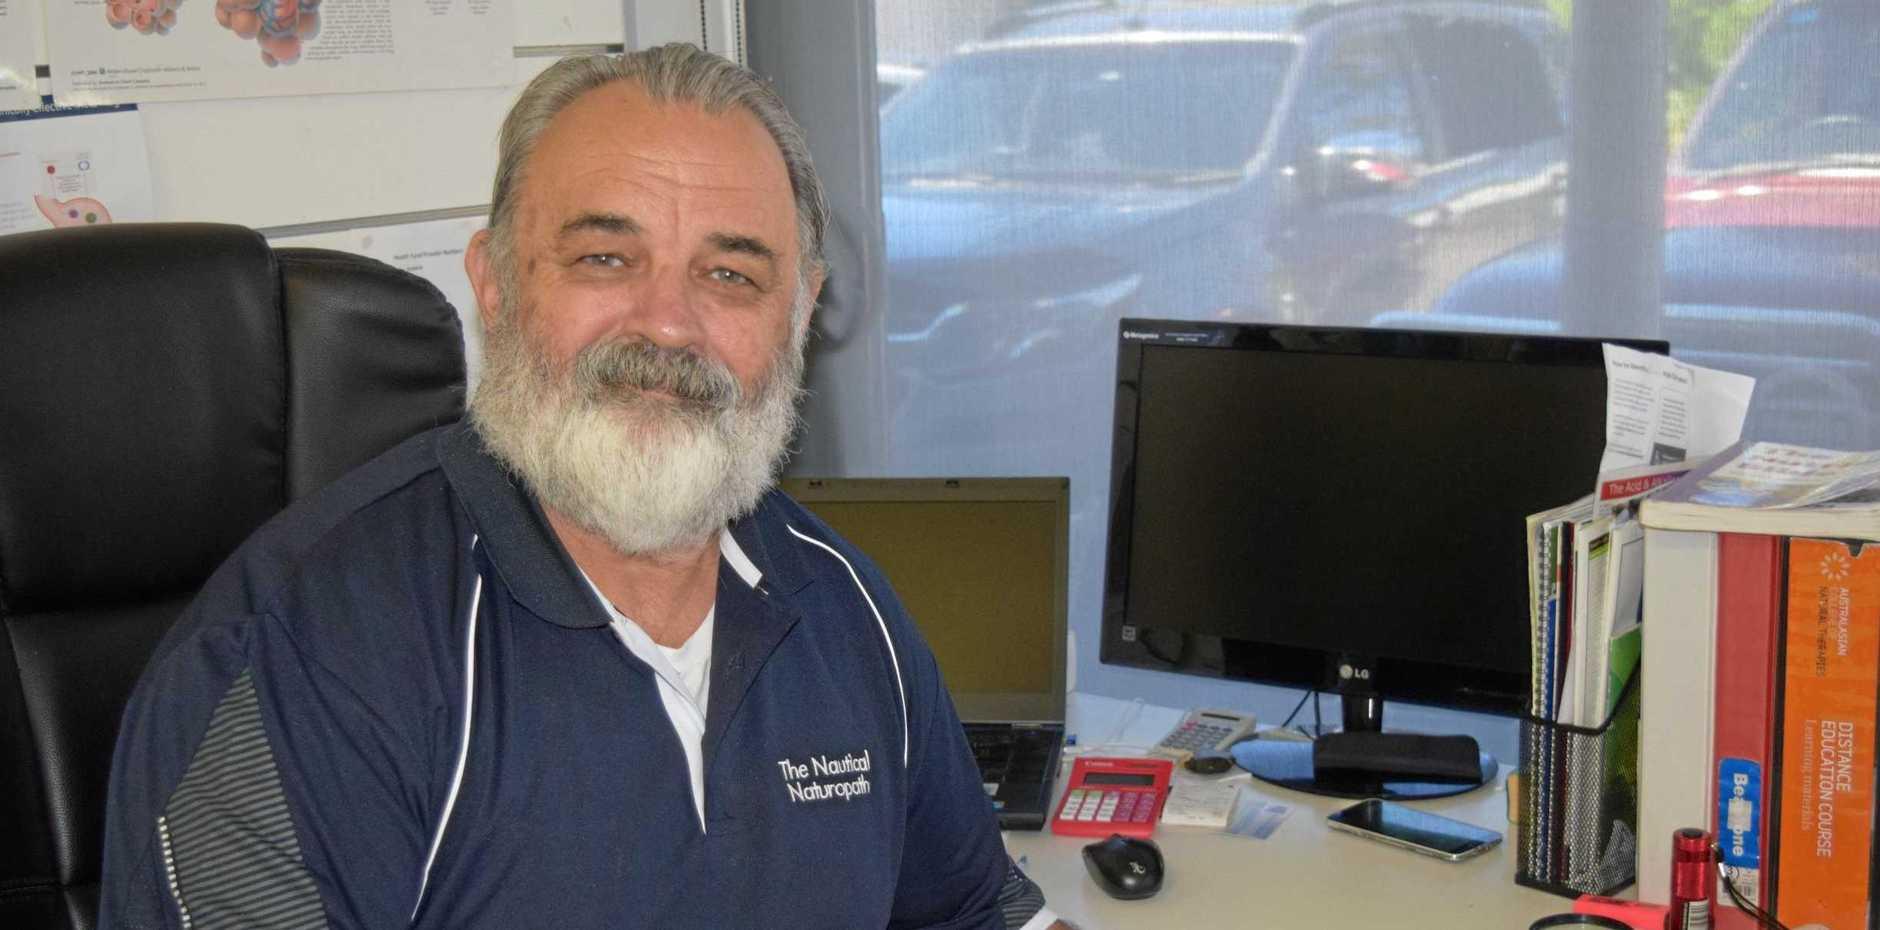 SUPPORT: The Nautical Naturopath David Kemp encourages men to take their health seriously.